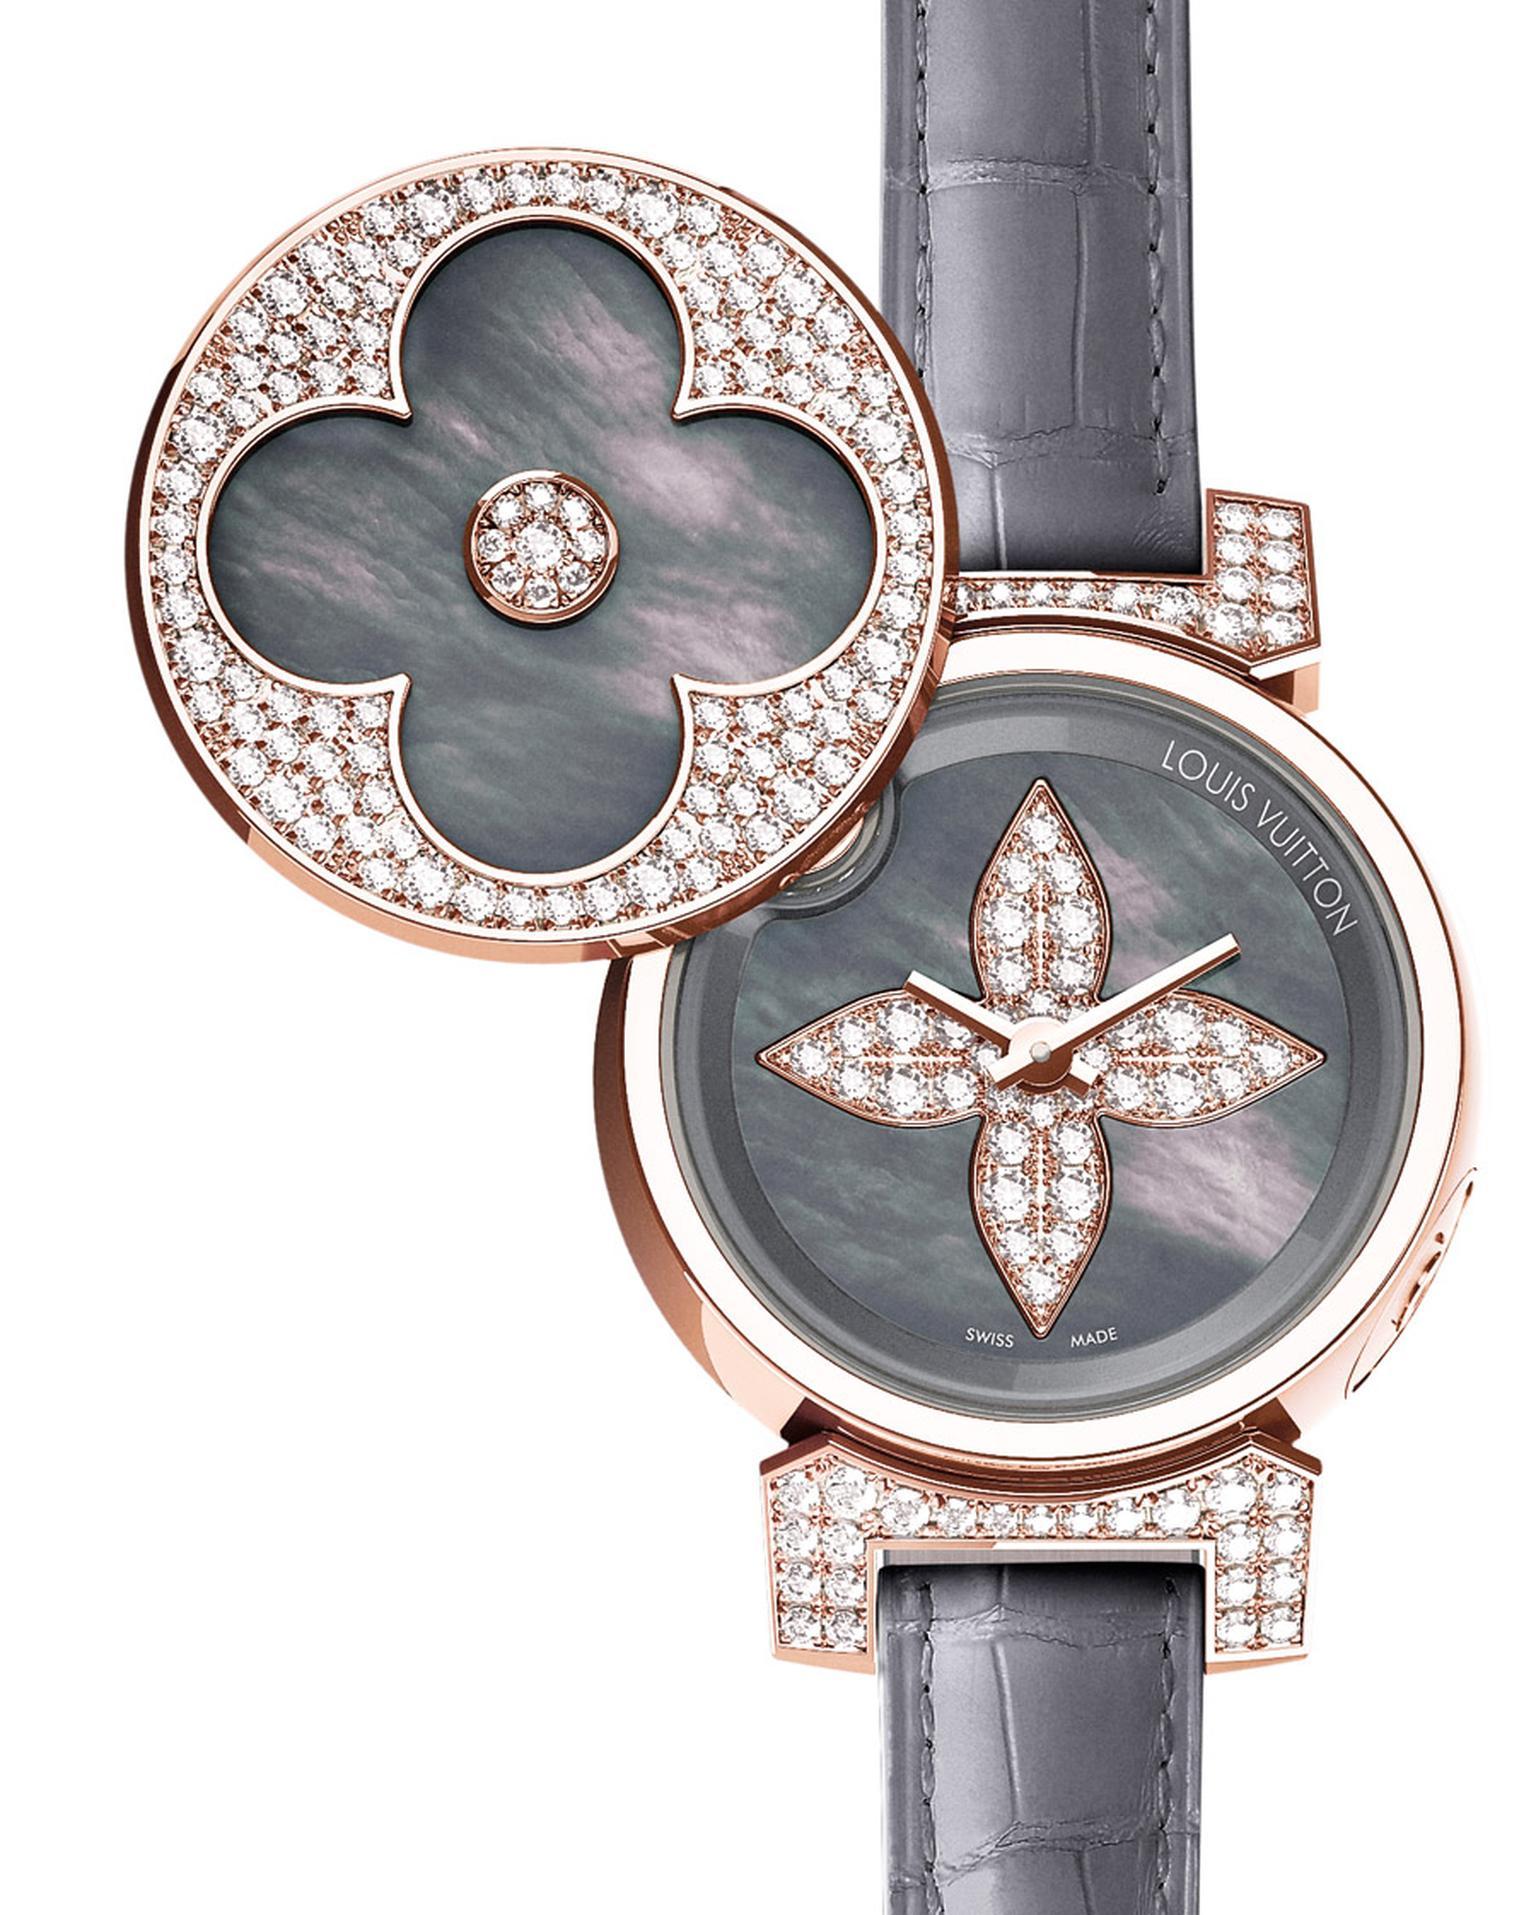 Louis vuitton đồng hồ nữ